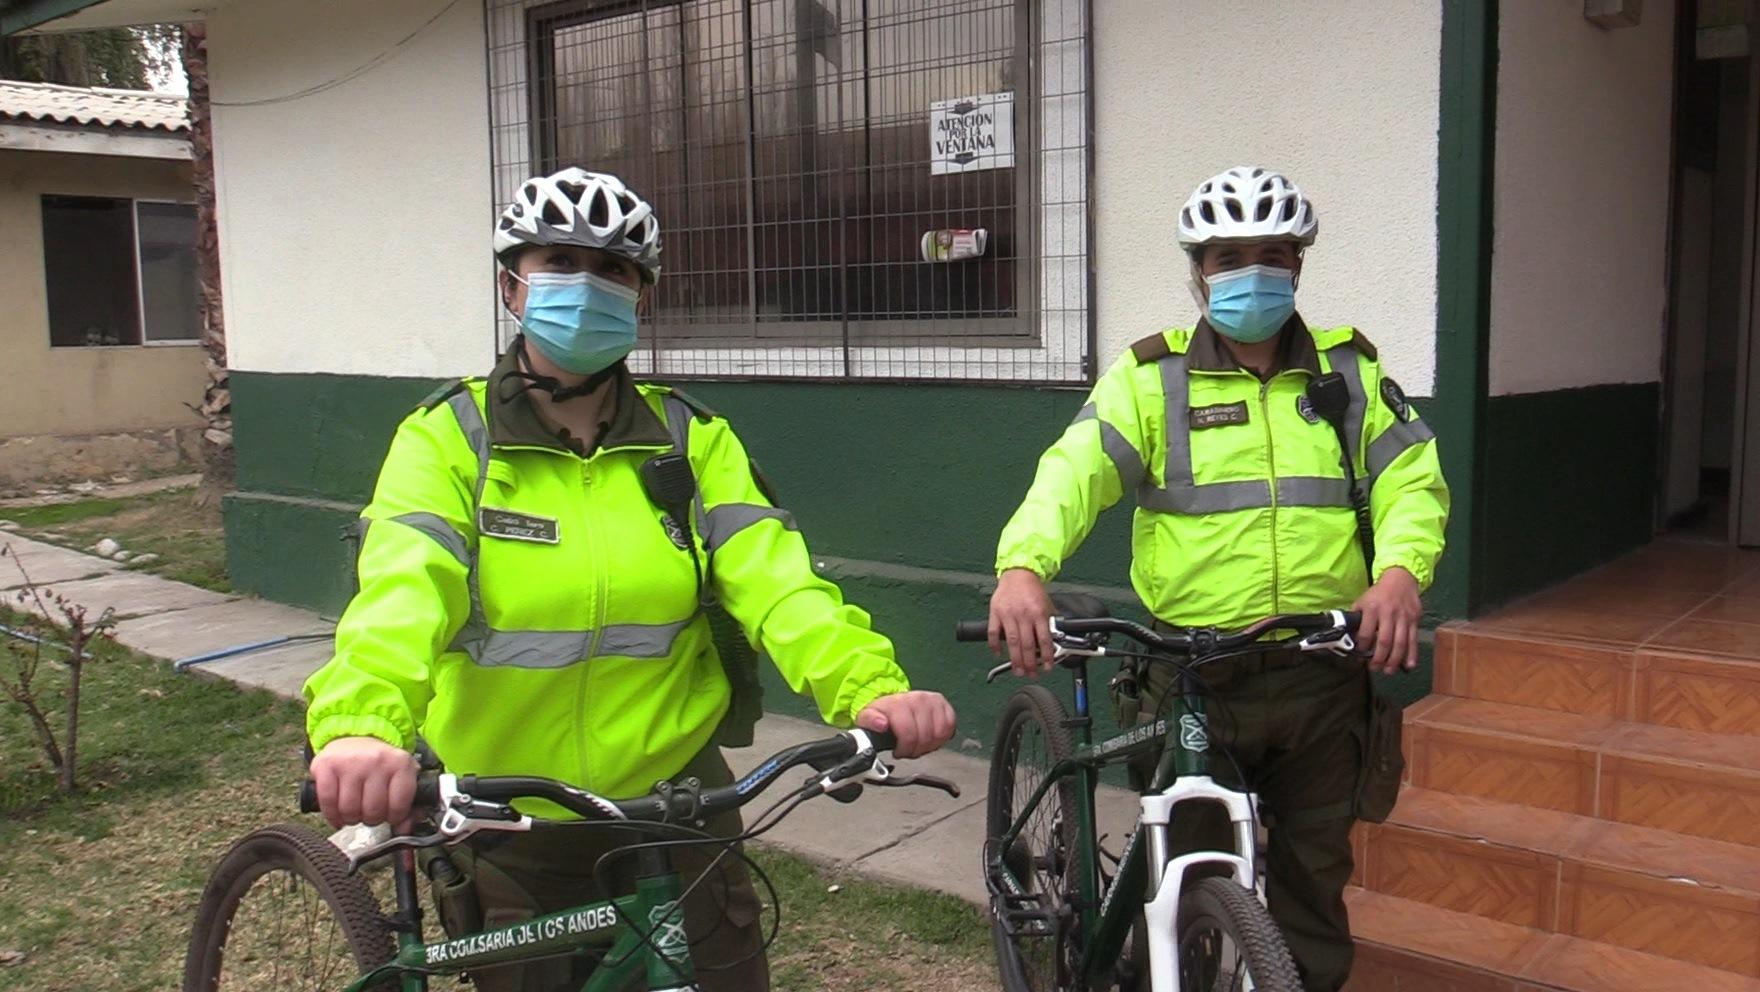 CALLE LARGA: Carabineros inició patrullajes en bicicleta por la comuna